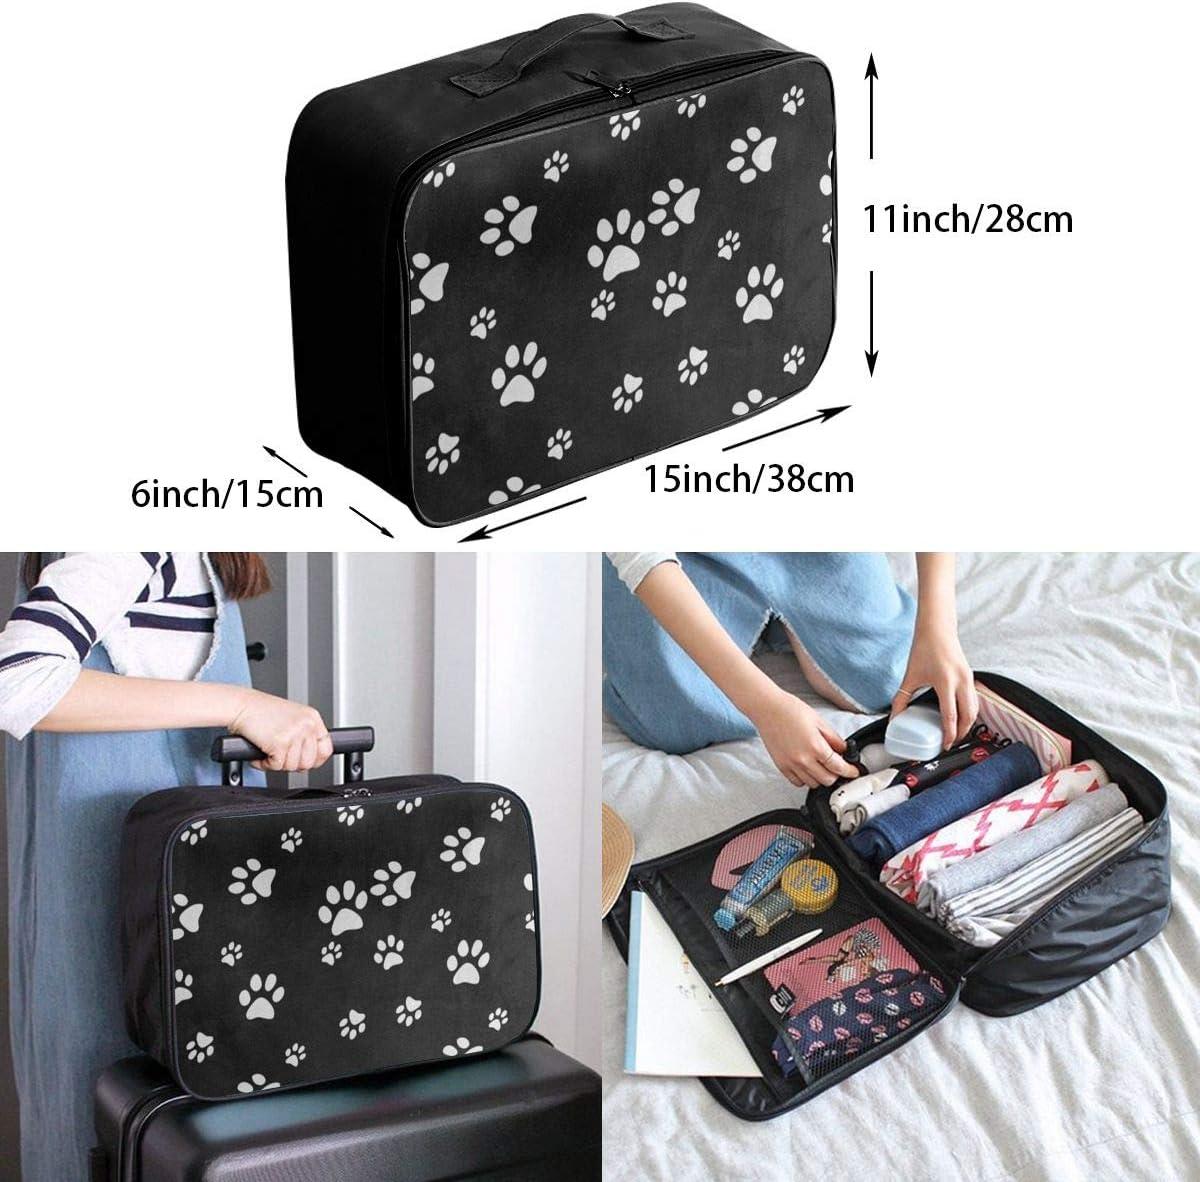 Travel Bags White Black Paw Print Portable Tote Hot Trolley Handle Luggage Bag